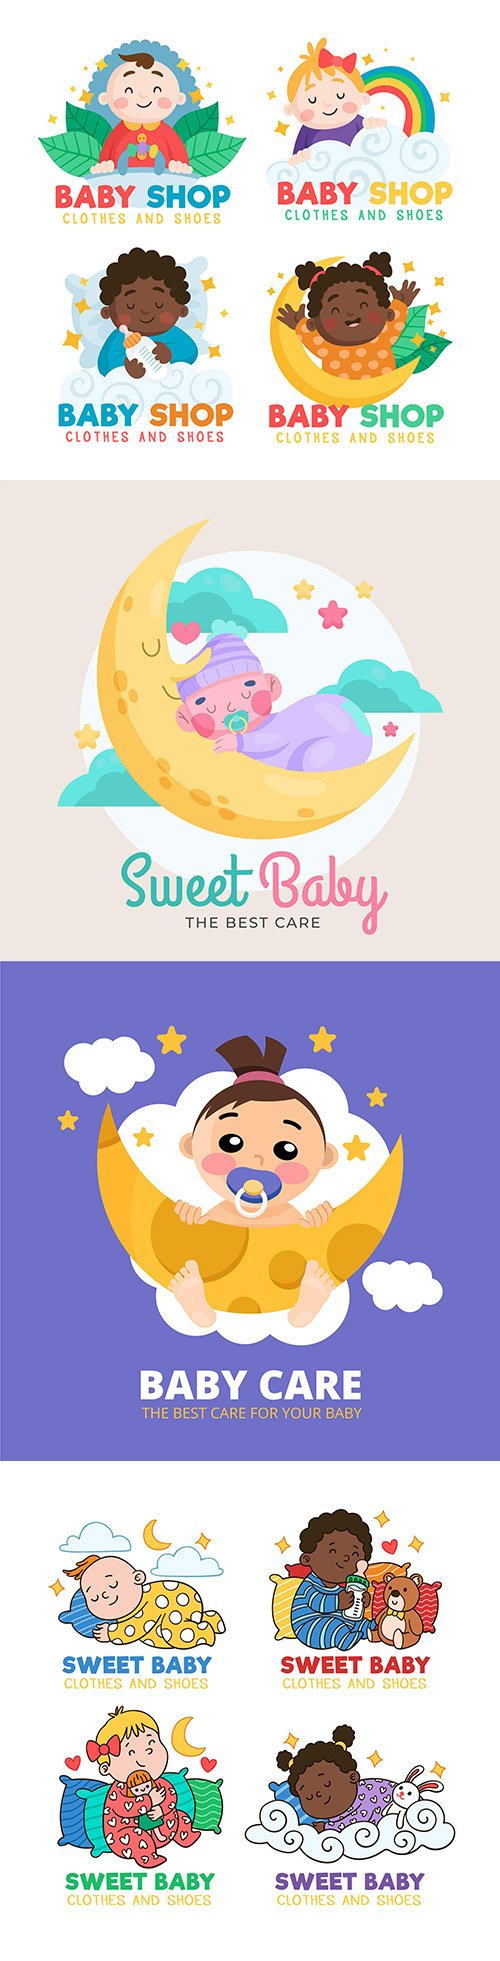 Baby logos brand name company design 2